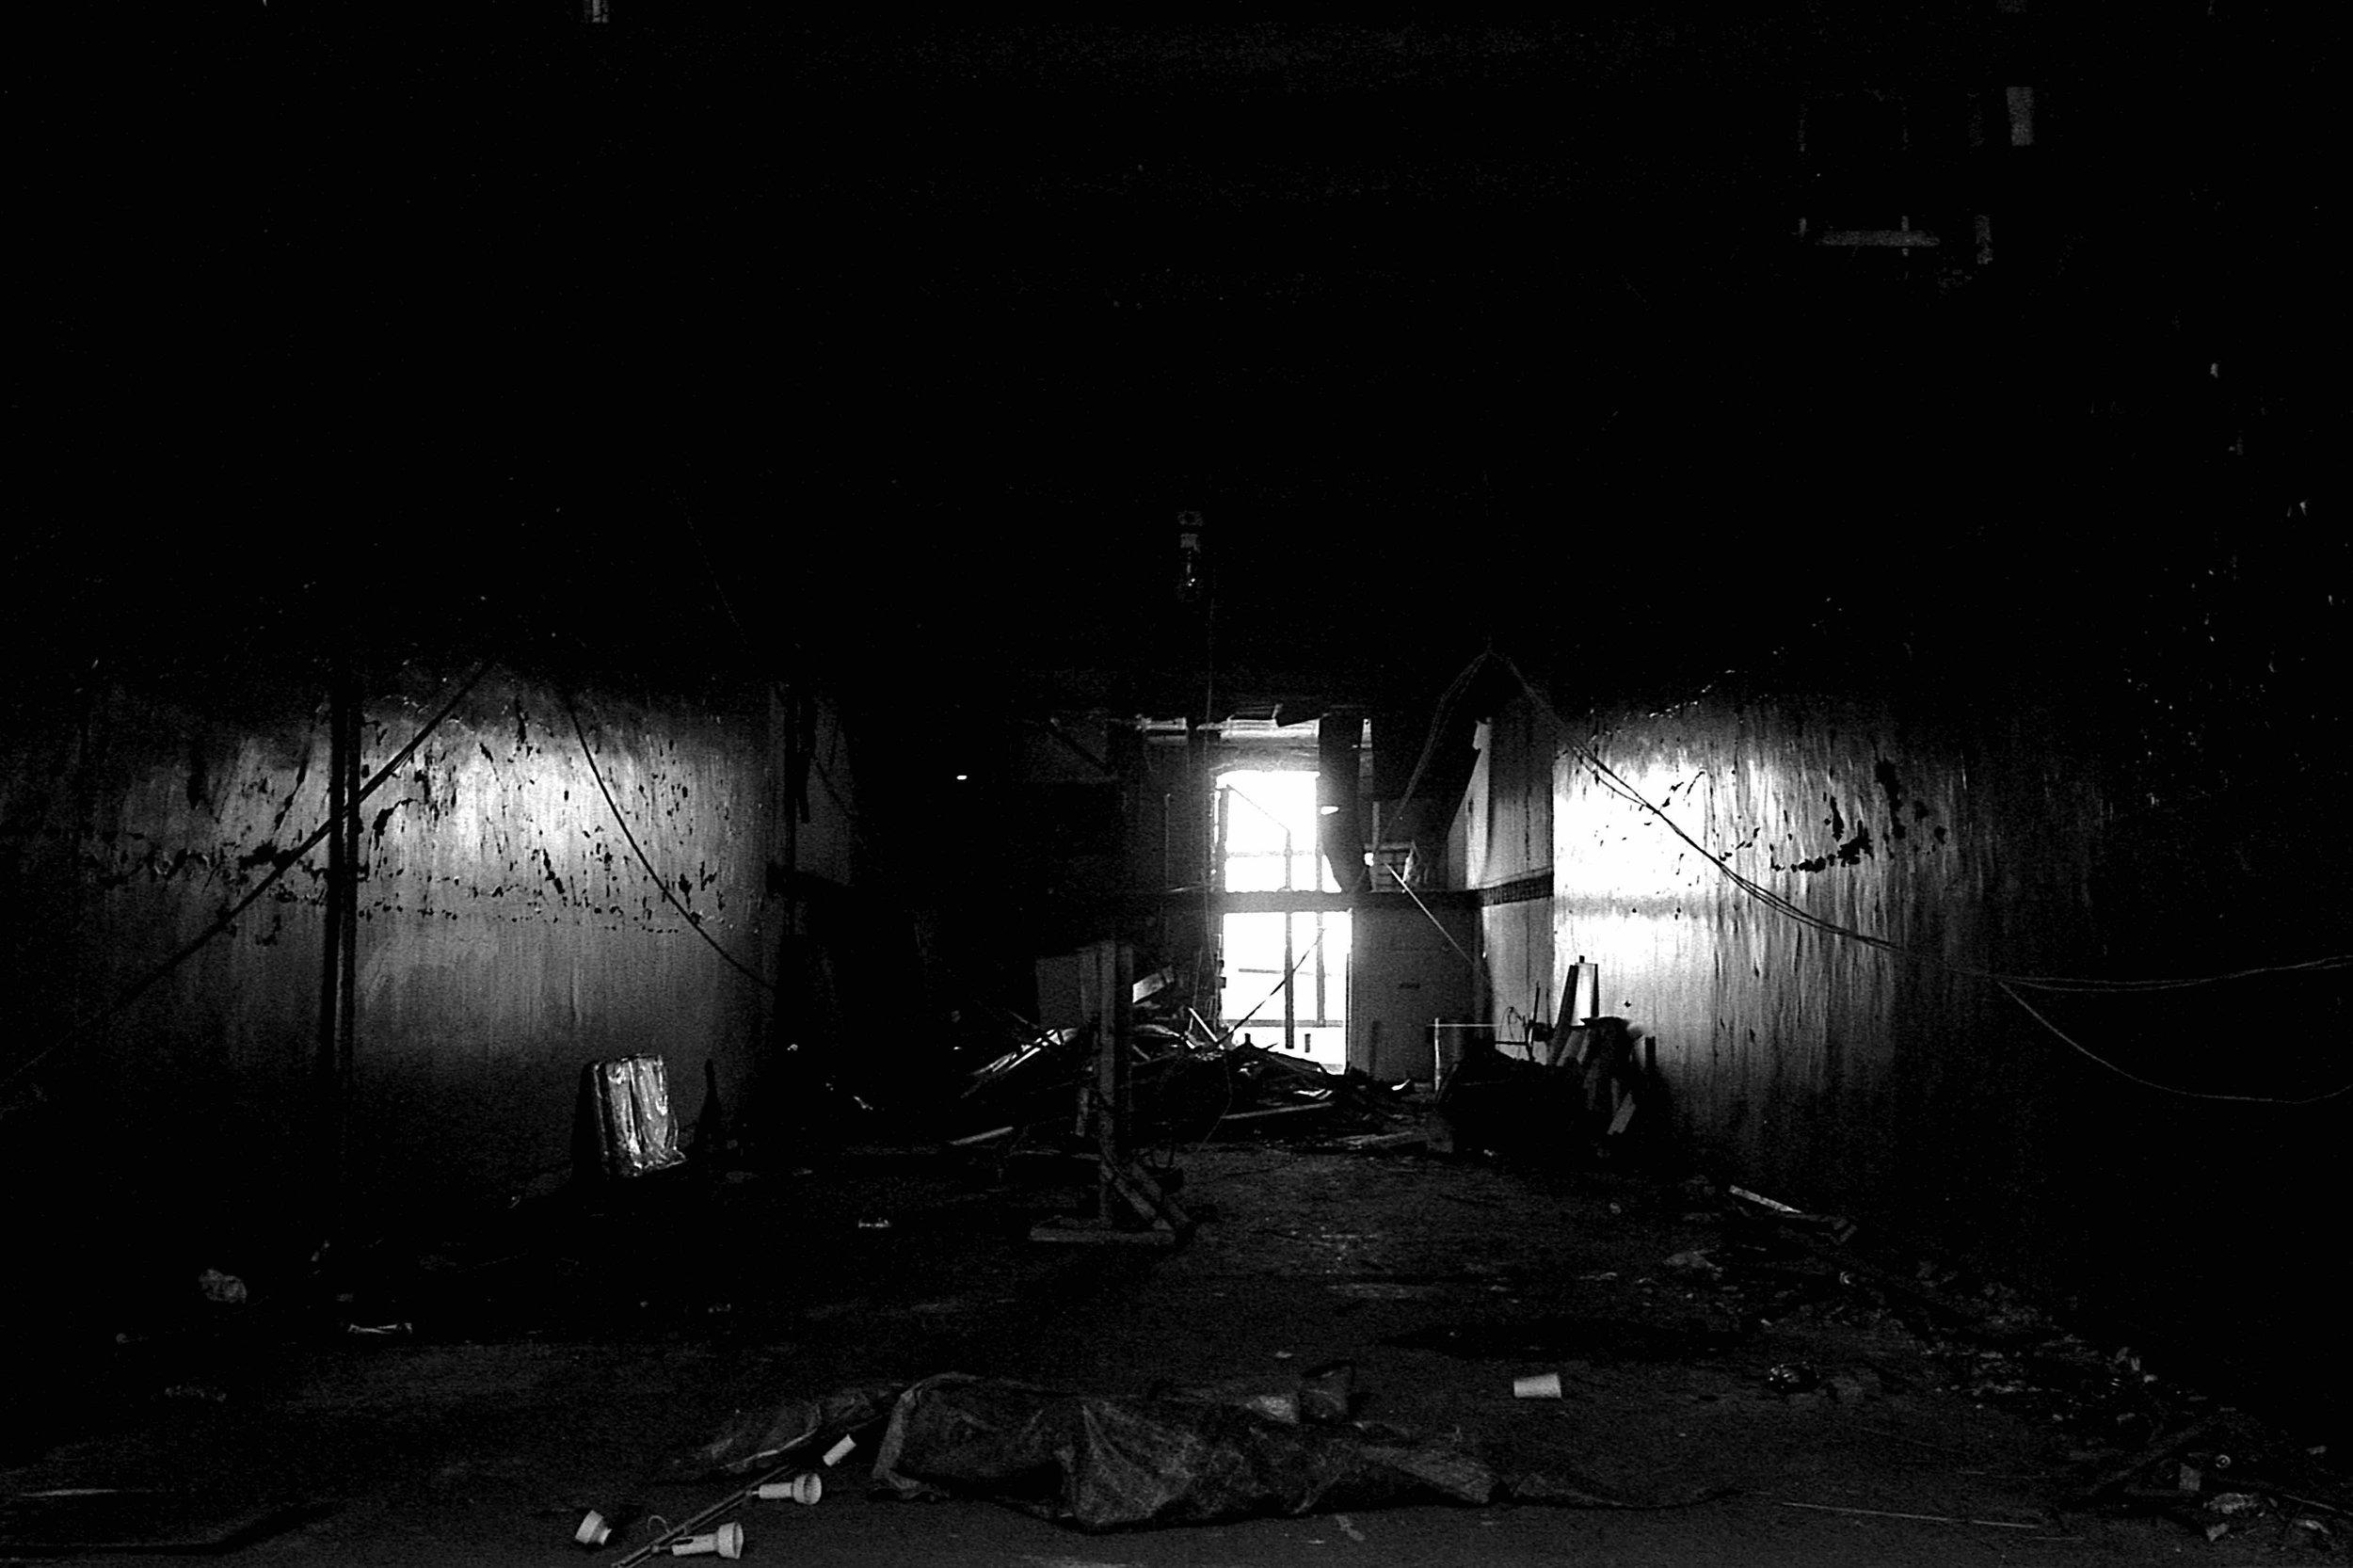 Matt Pittman / Huntsville, AL / Ilford HP5 / Leica M7 / Film Photography